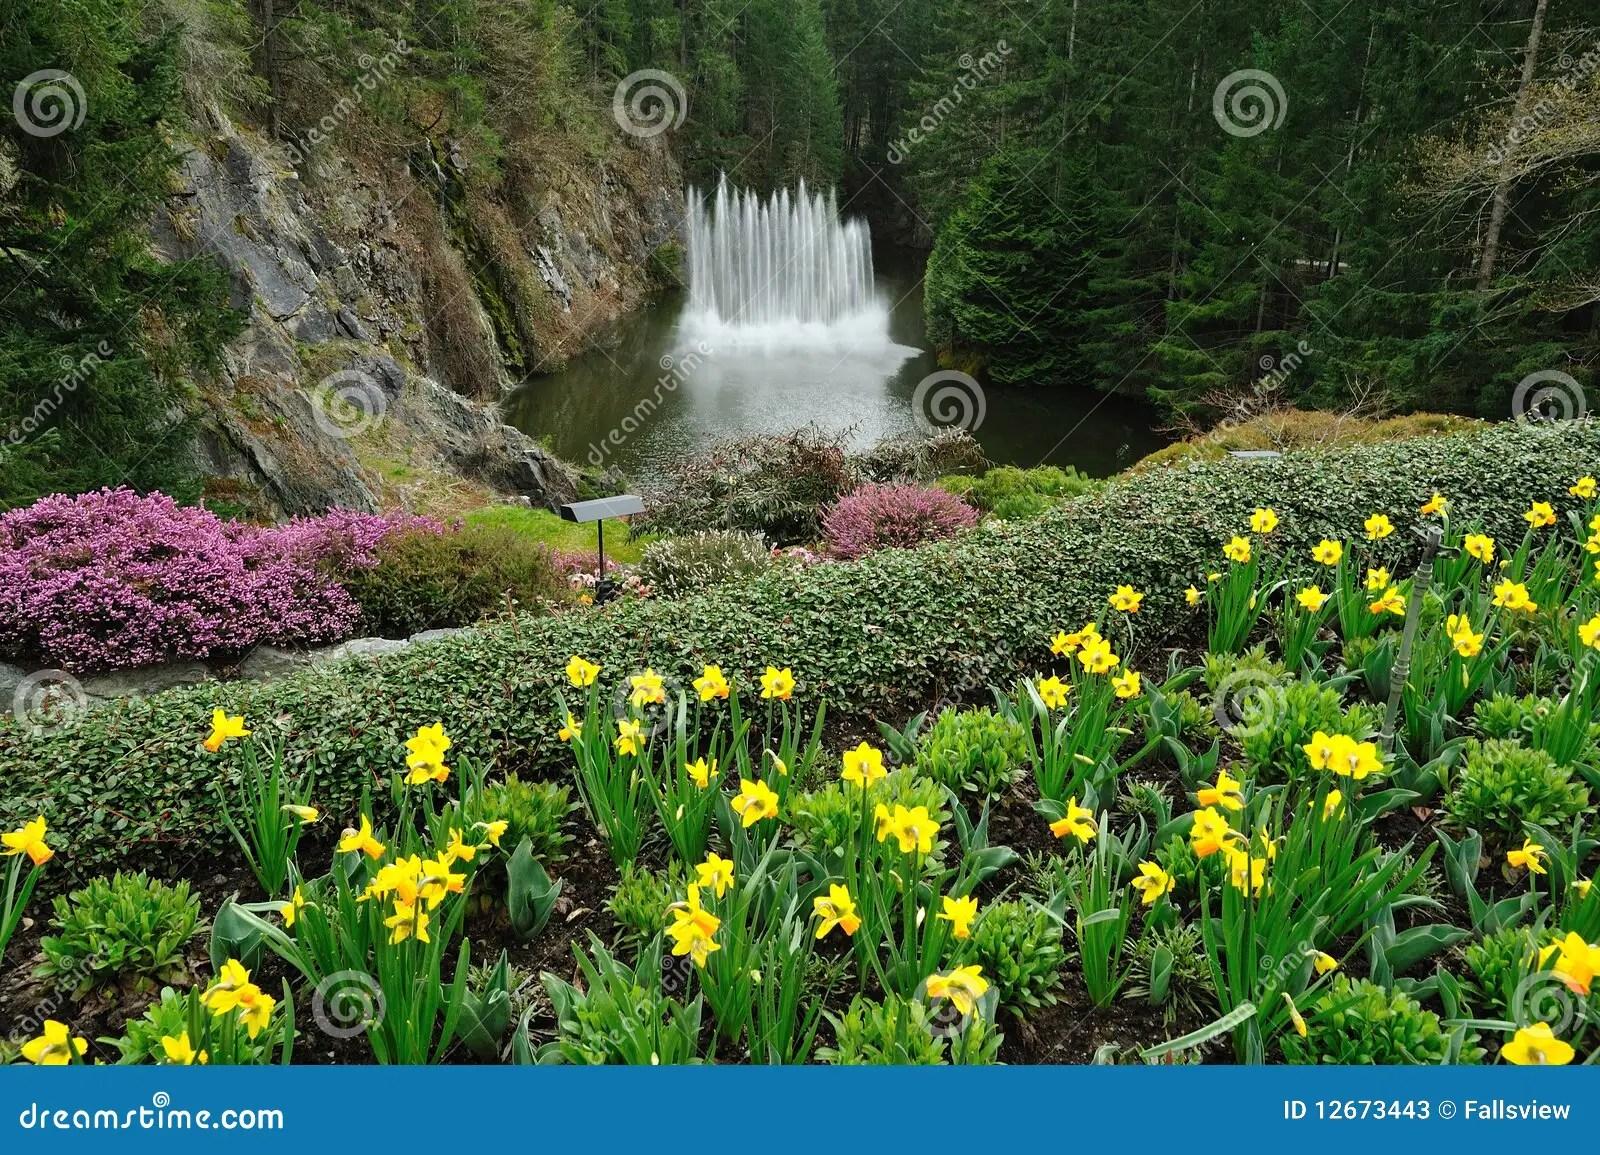 How Plant Pond Plants